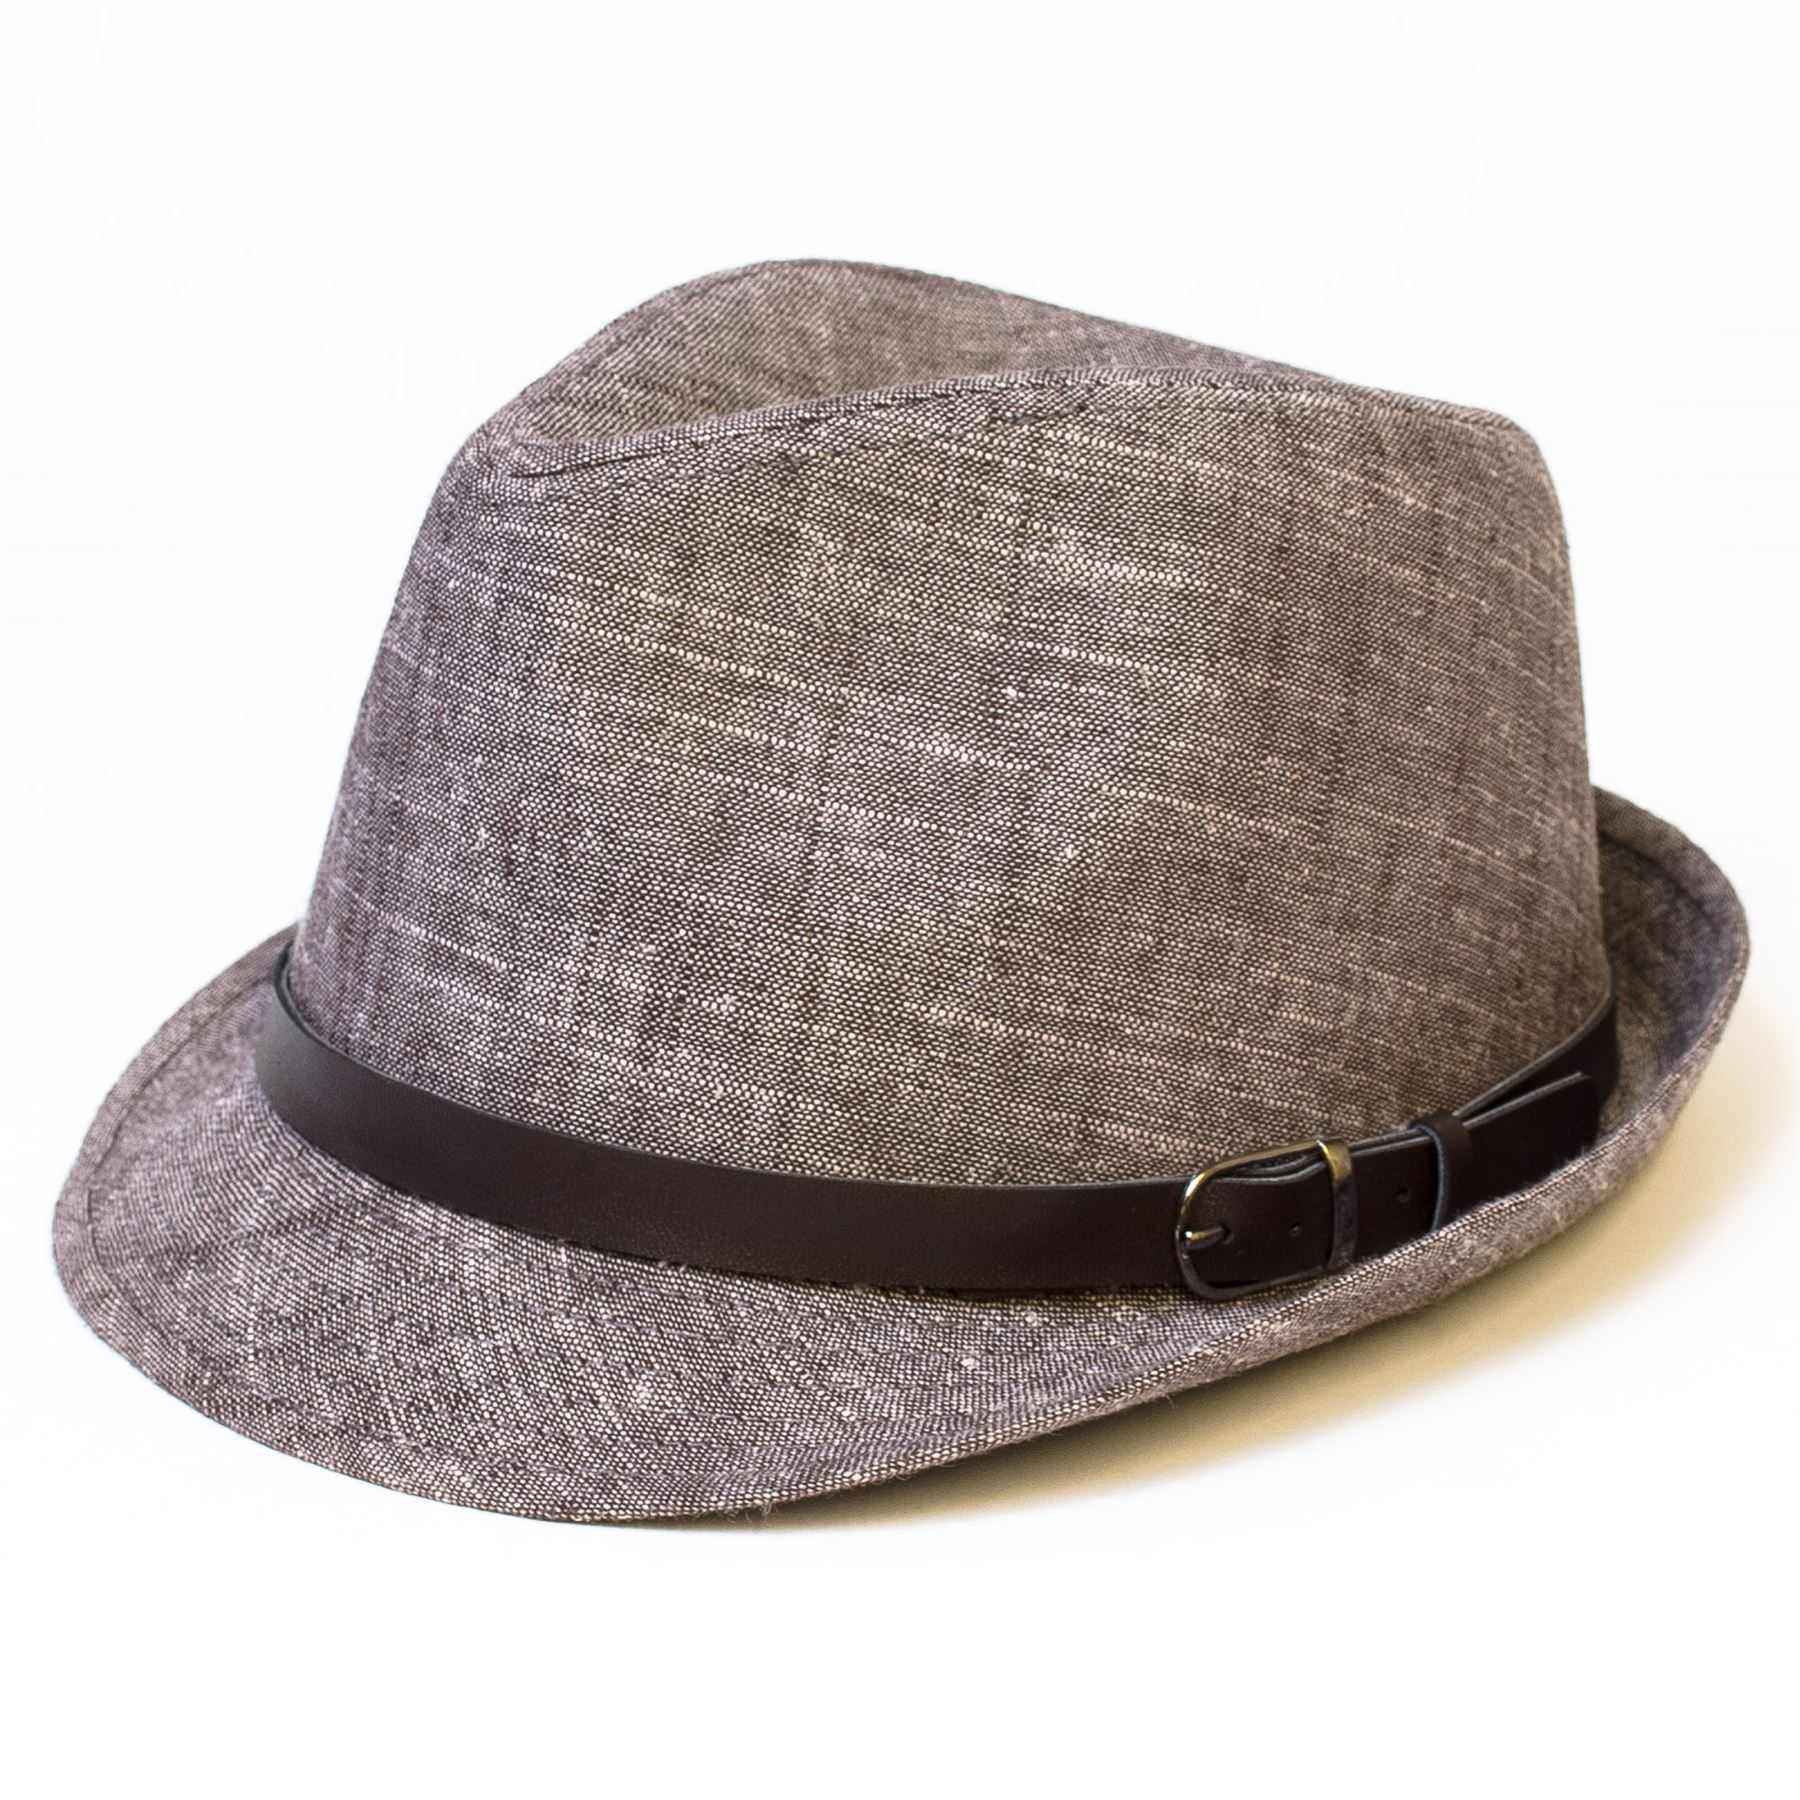 Herren Damen Trilby Hut Fedora Hut Filzhut Mütze